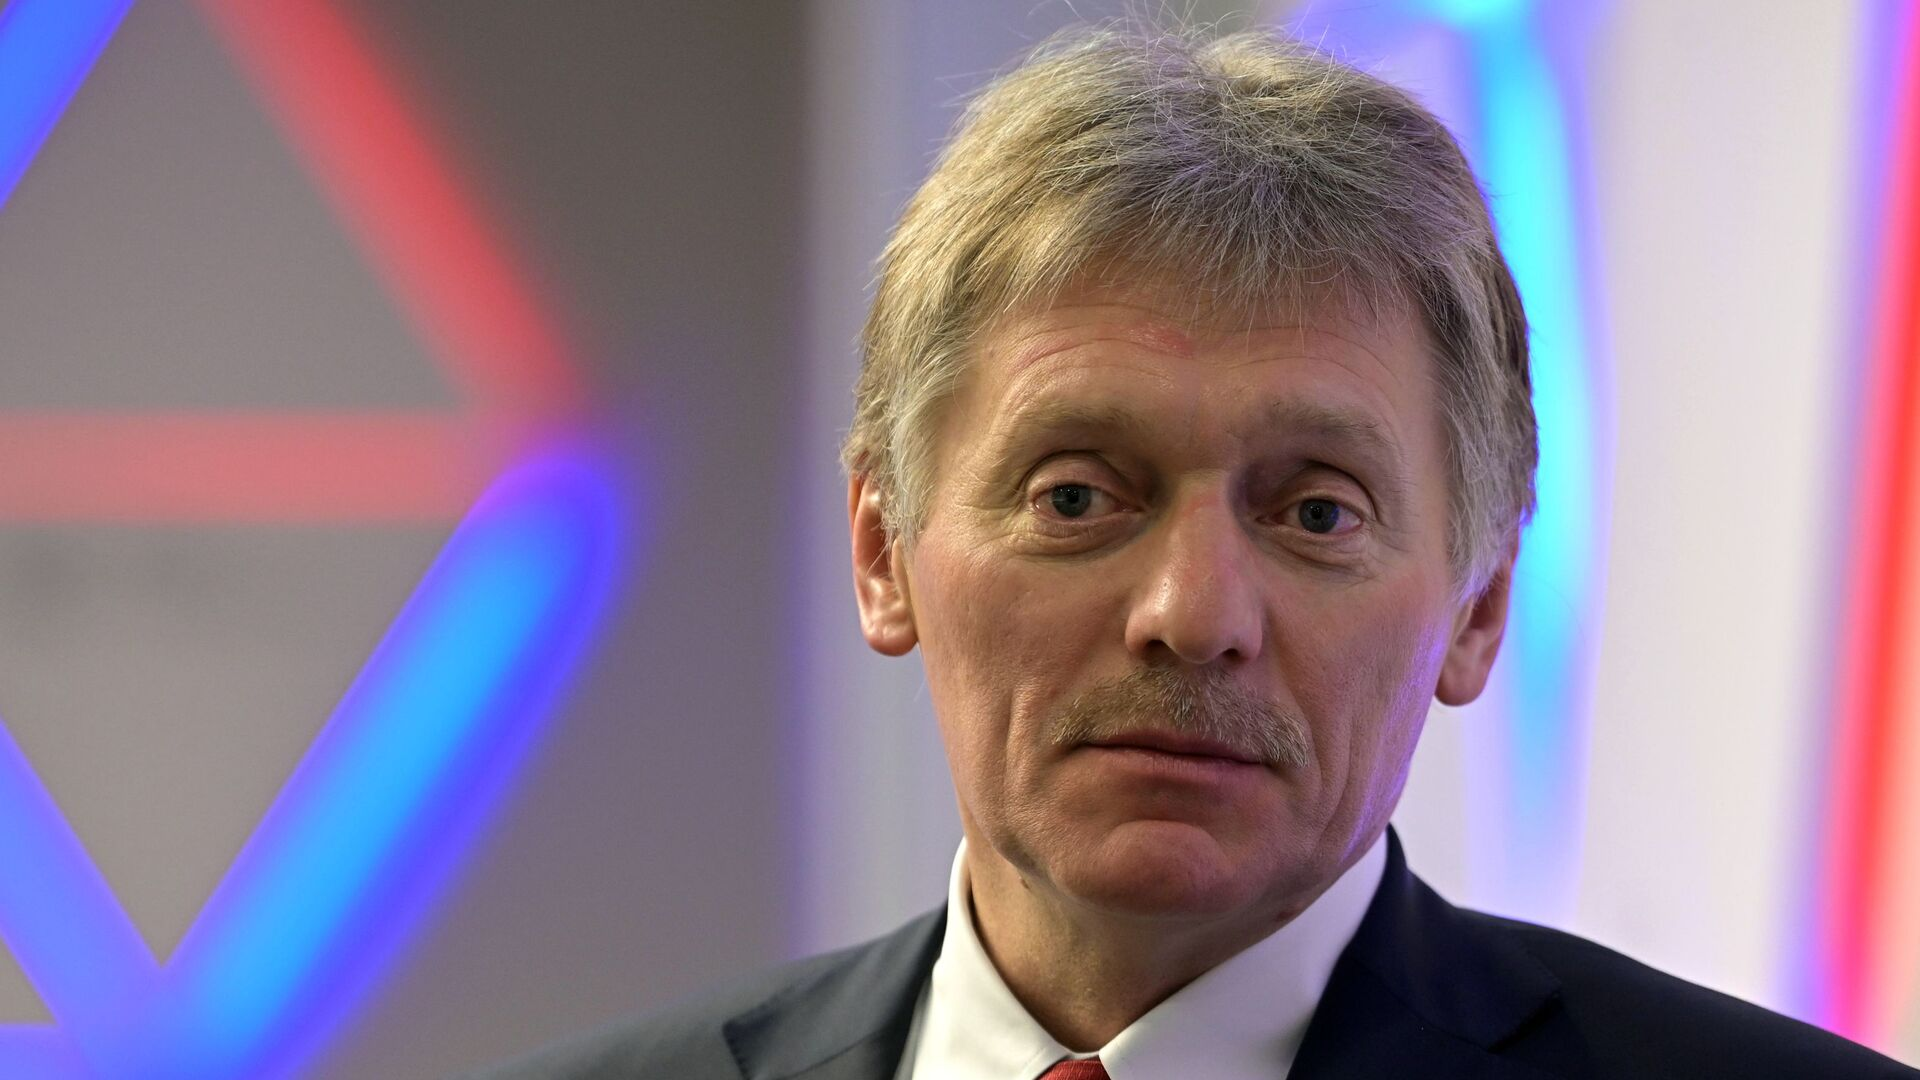 Пресс-секретарь президента РФ Дмитрий Песков - Sputnik Беларусь, 1920, 11.10.2021